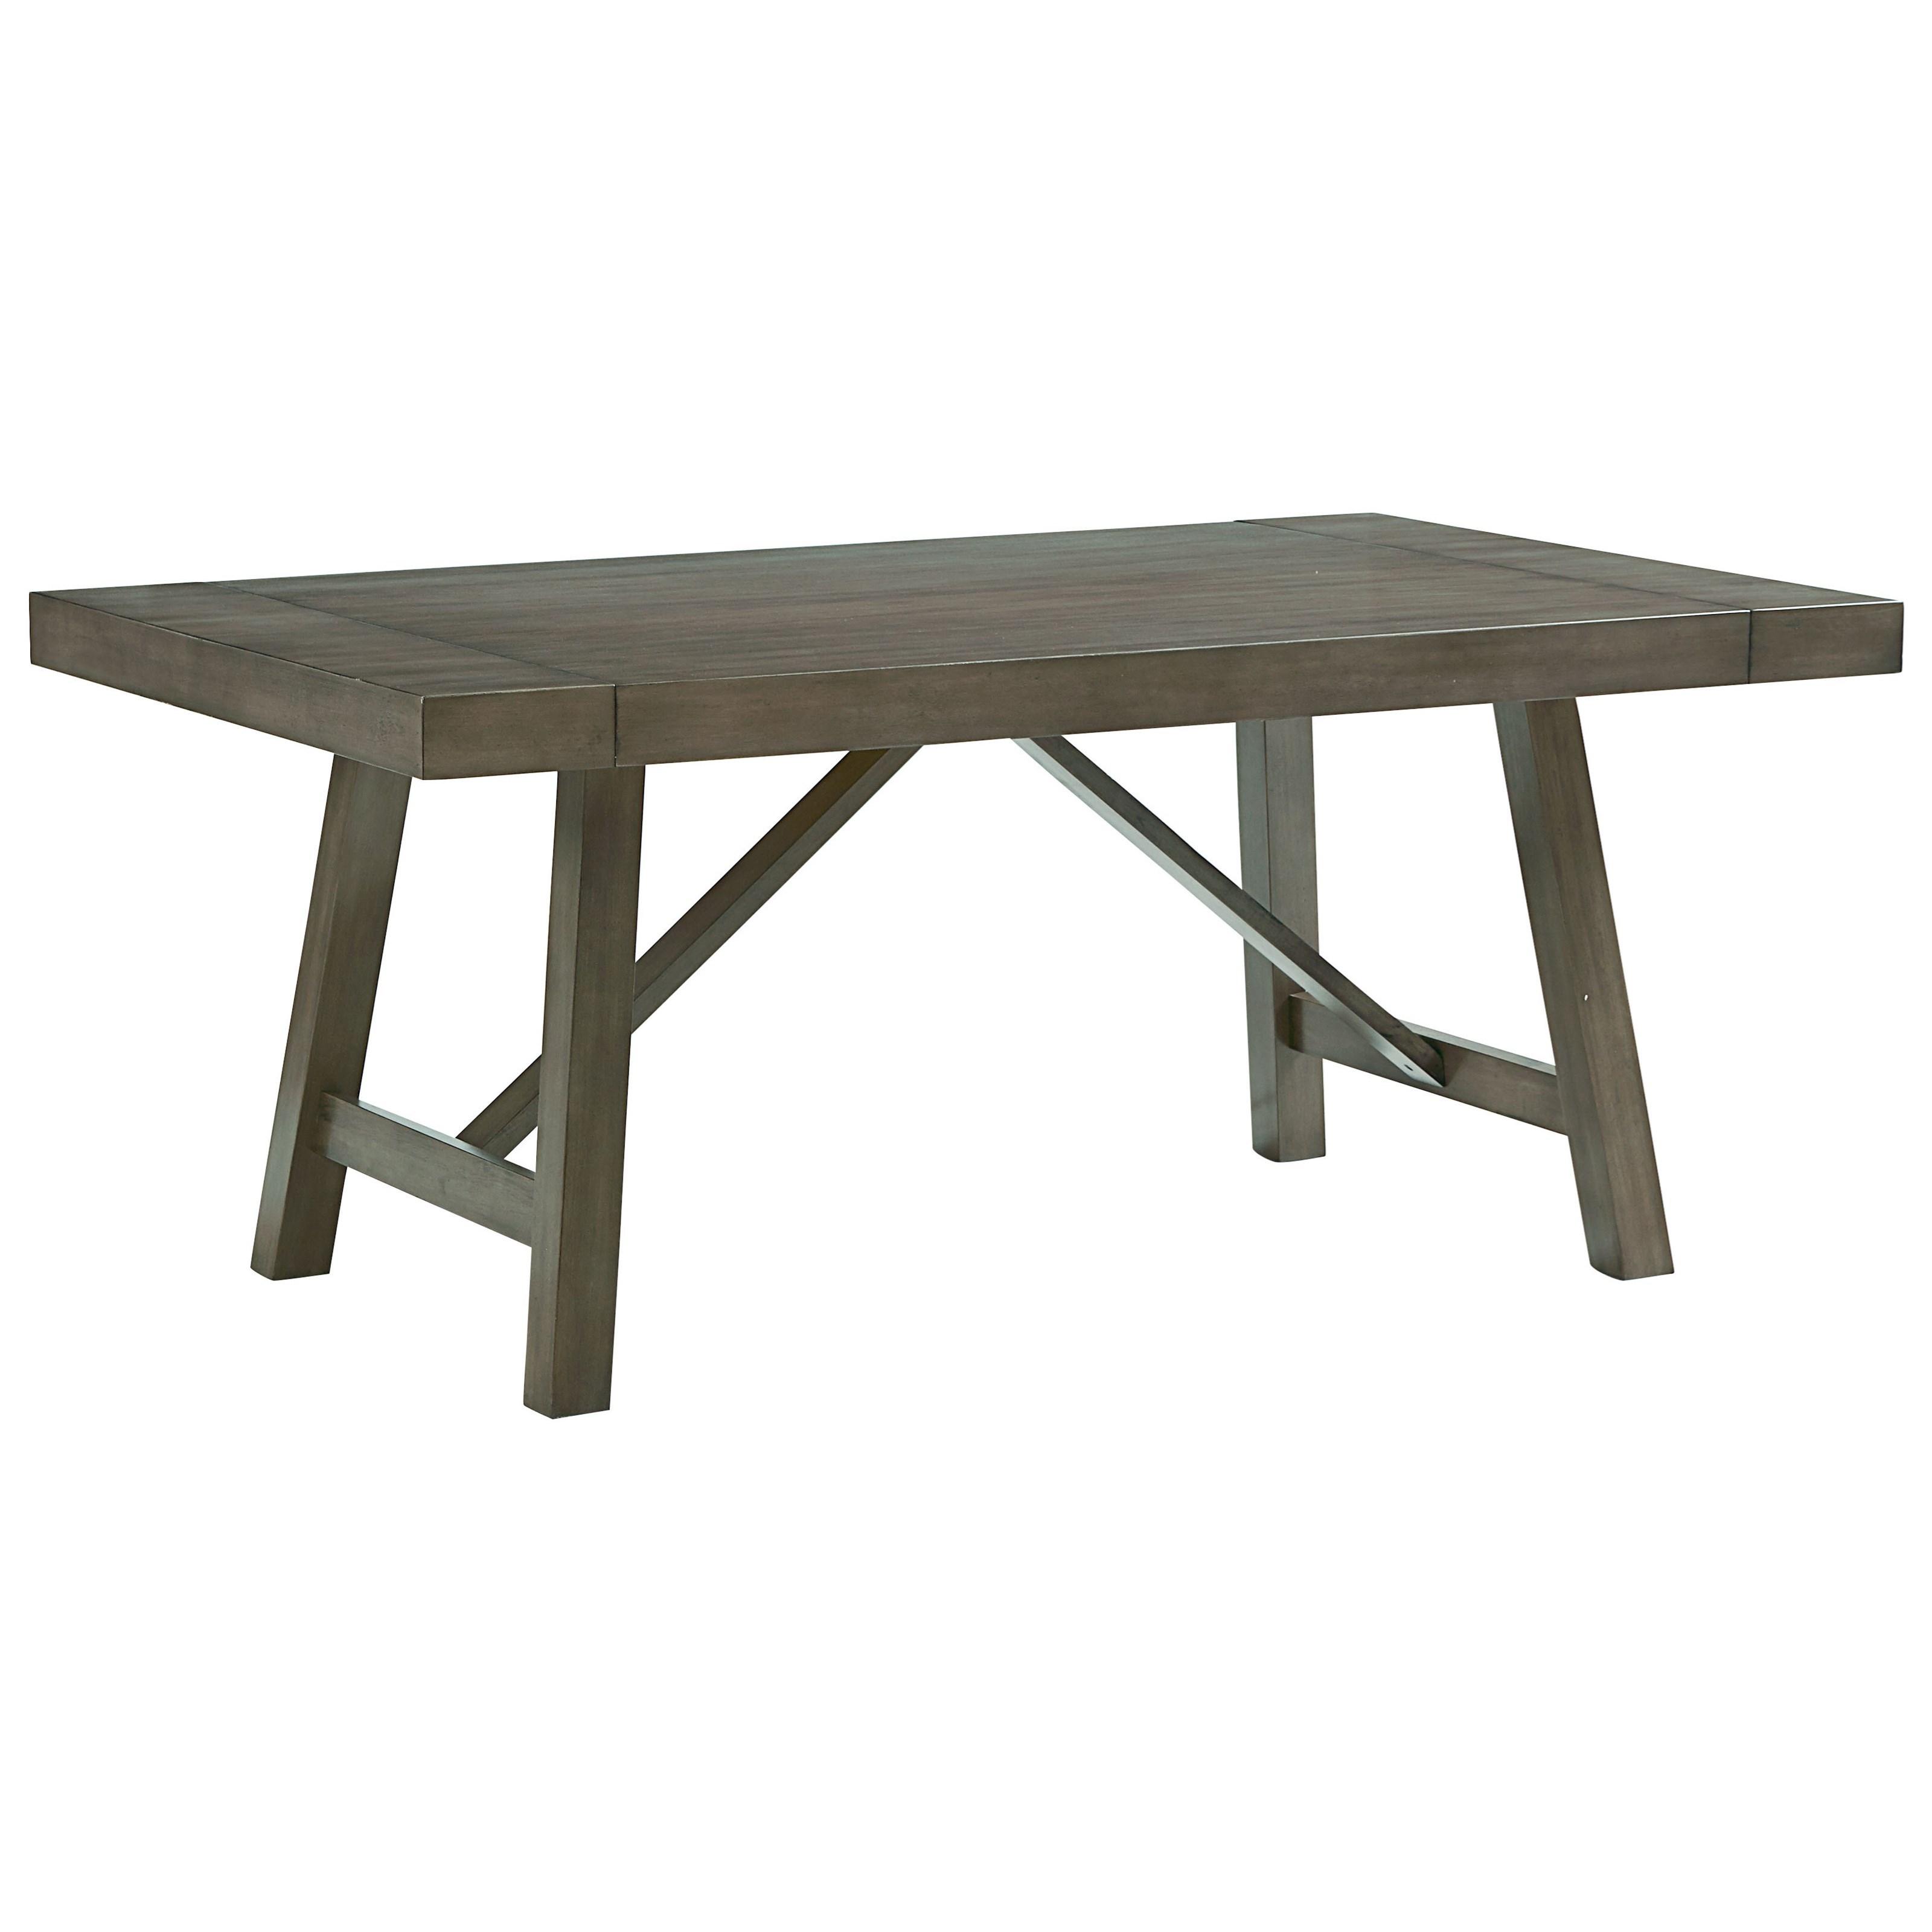 Standard furniture omaha grey trestle dining room table for Dining room tables trestle